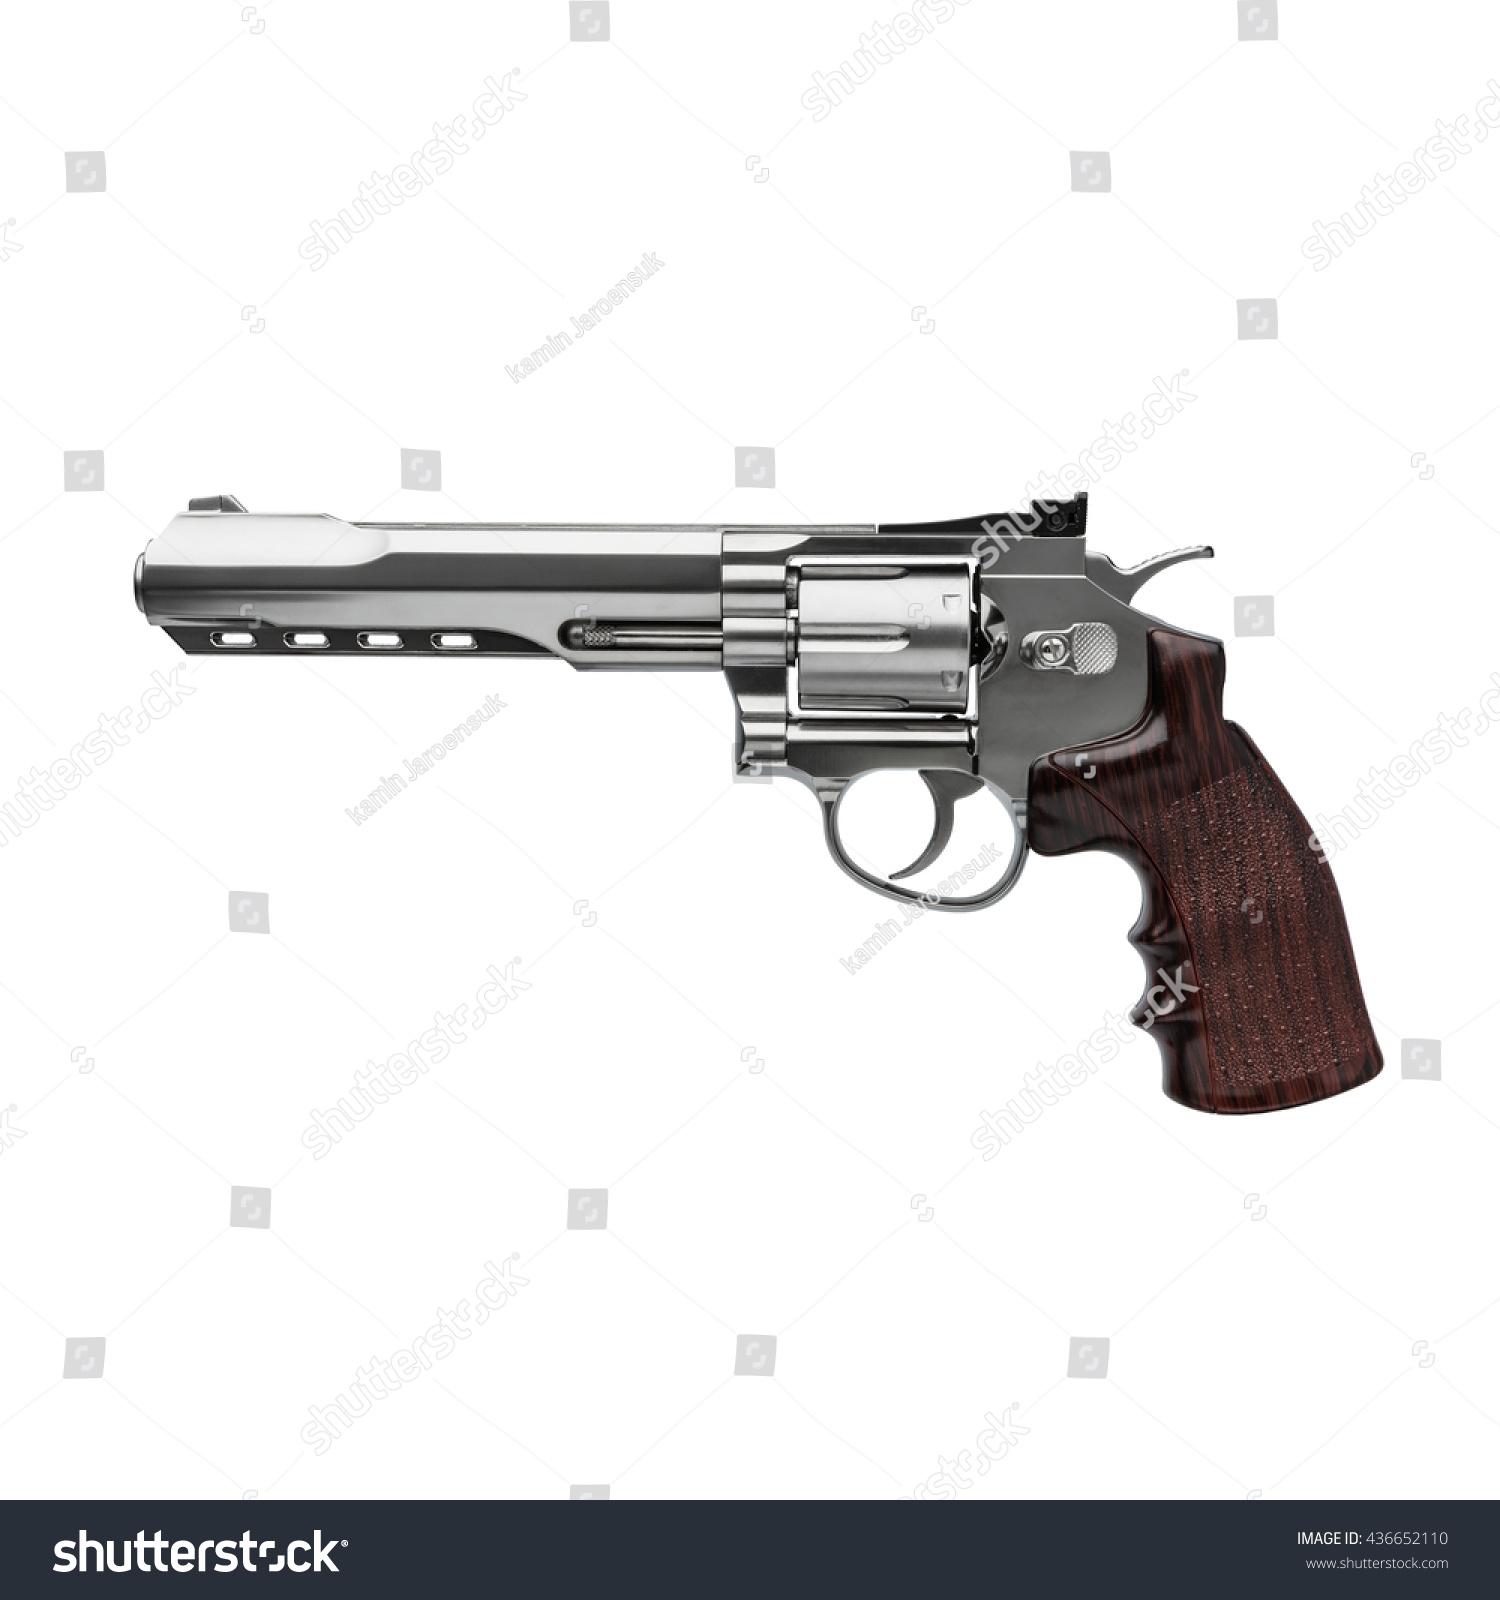 gun white background - photo #41